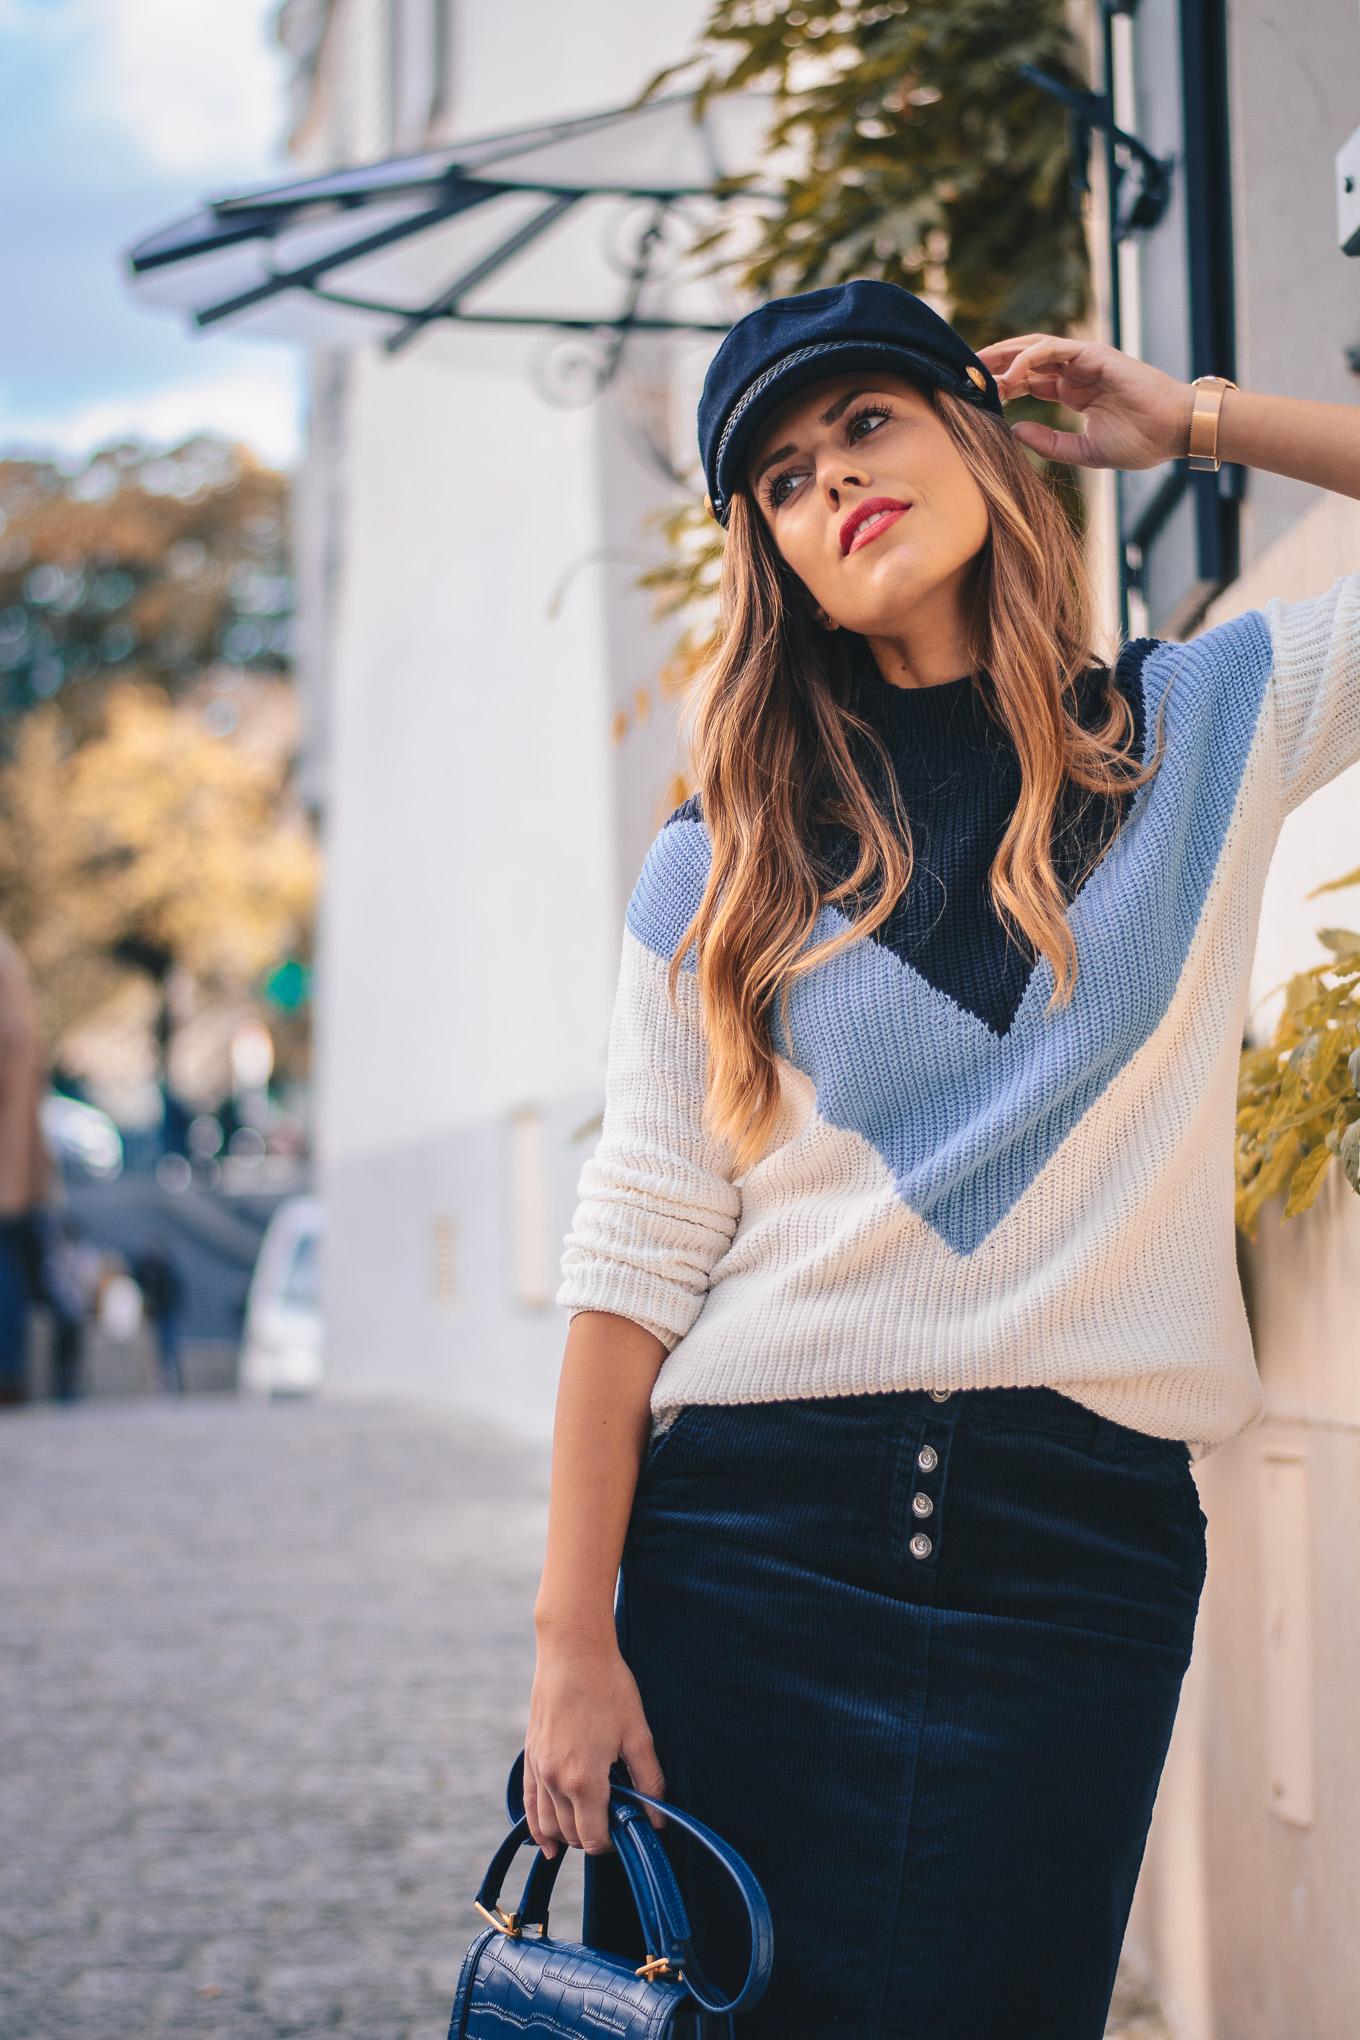 Paris fashion blogger Denina Martin